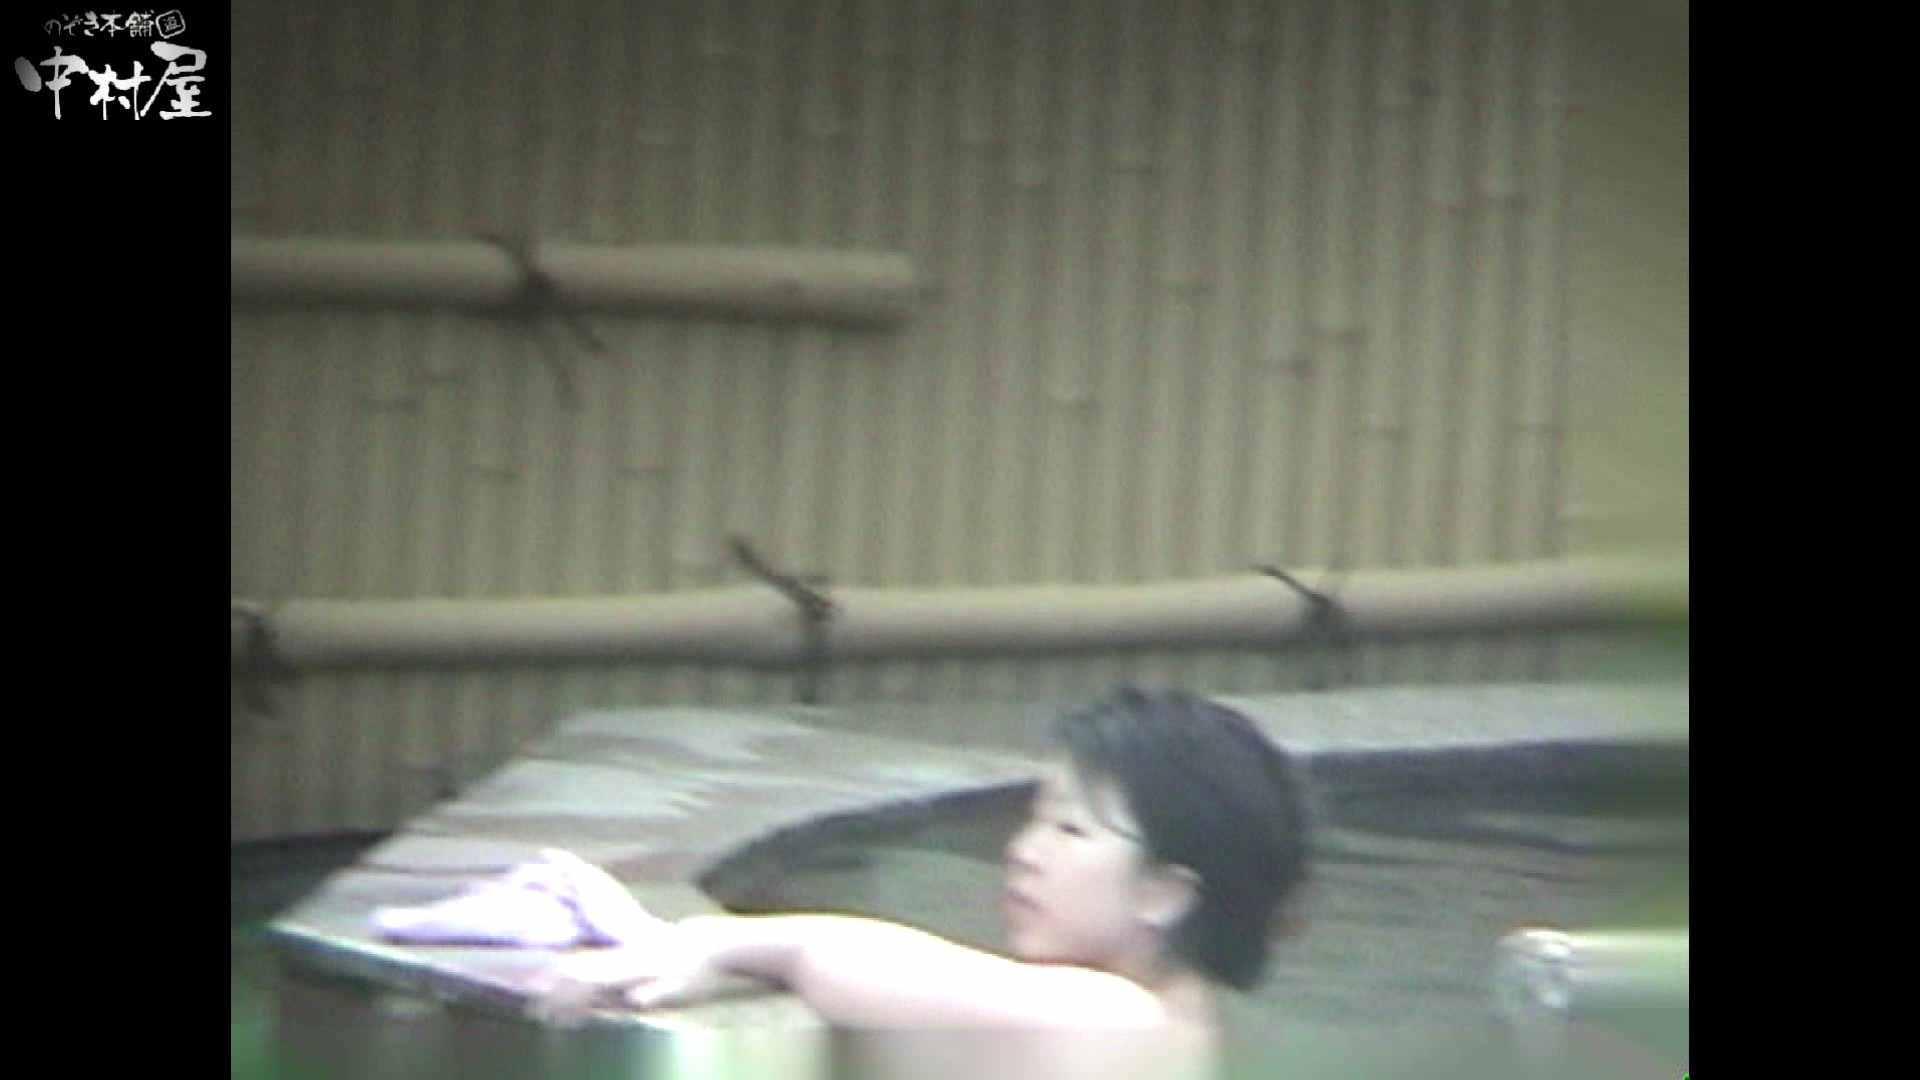 Aquaな露天風呂Vol.936 盗撮シリーズ | 露天風呂編  90PIX 7